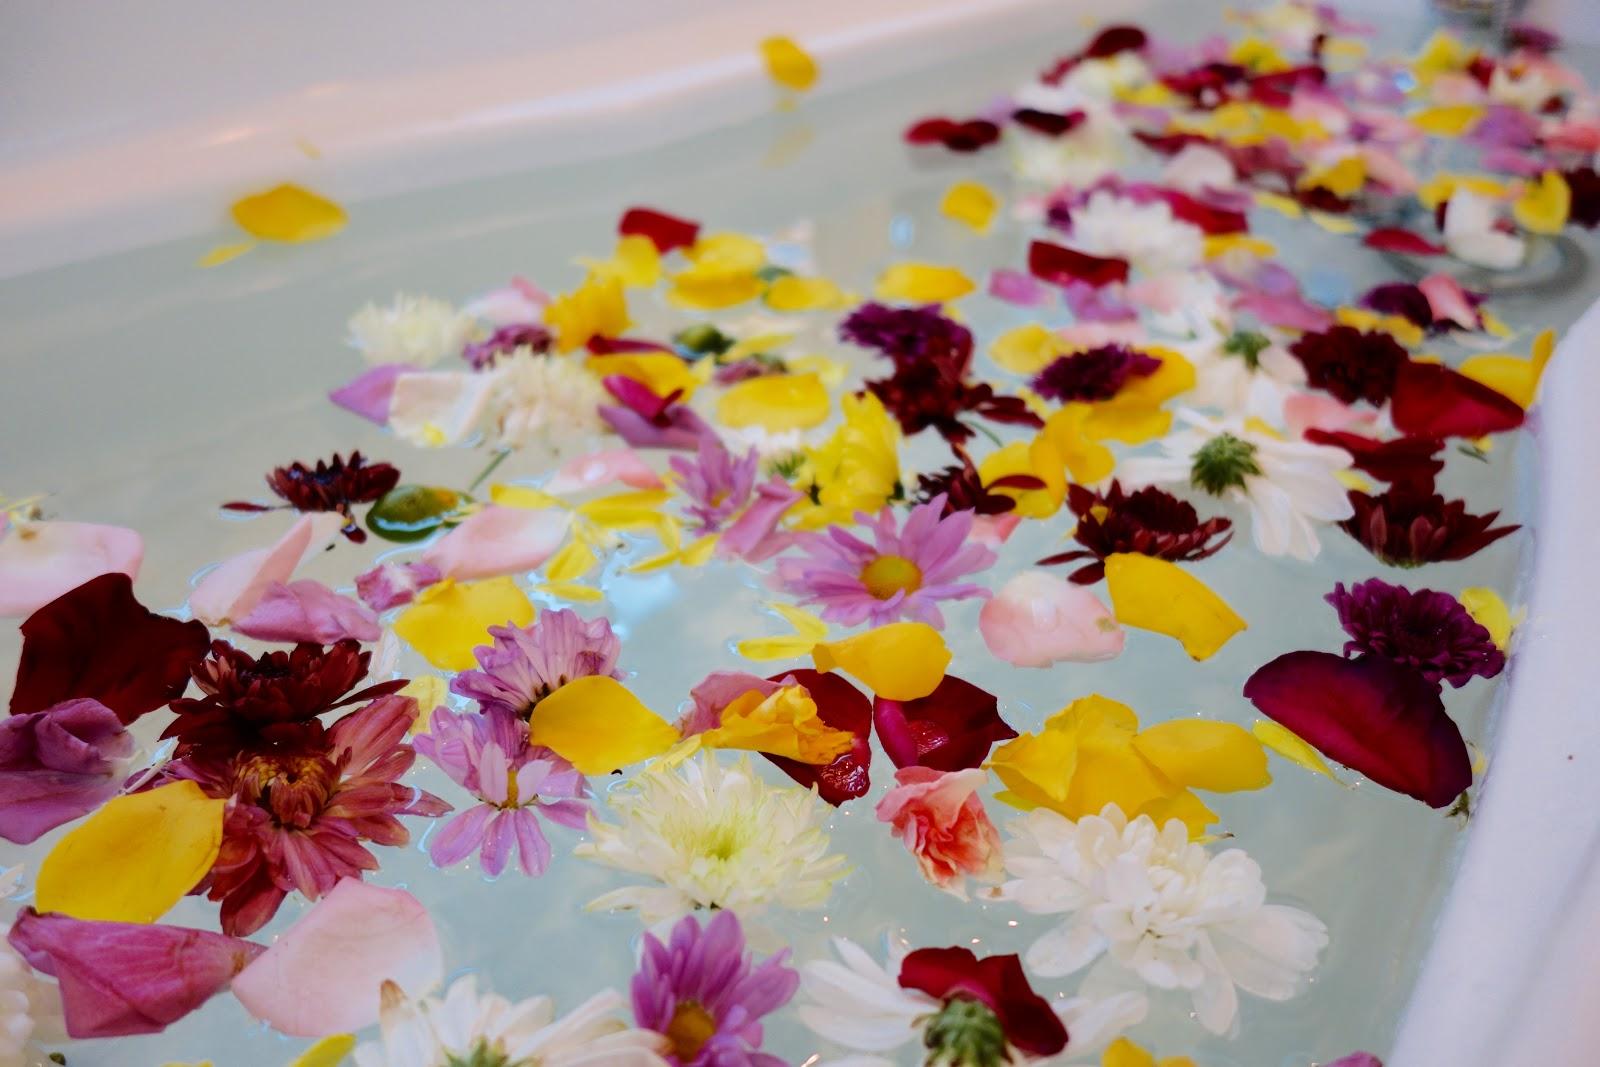 Flower Bathtub 28 Images Flower Garden In A Bathtub